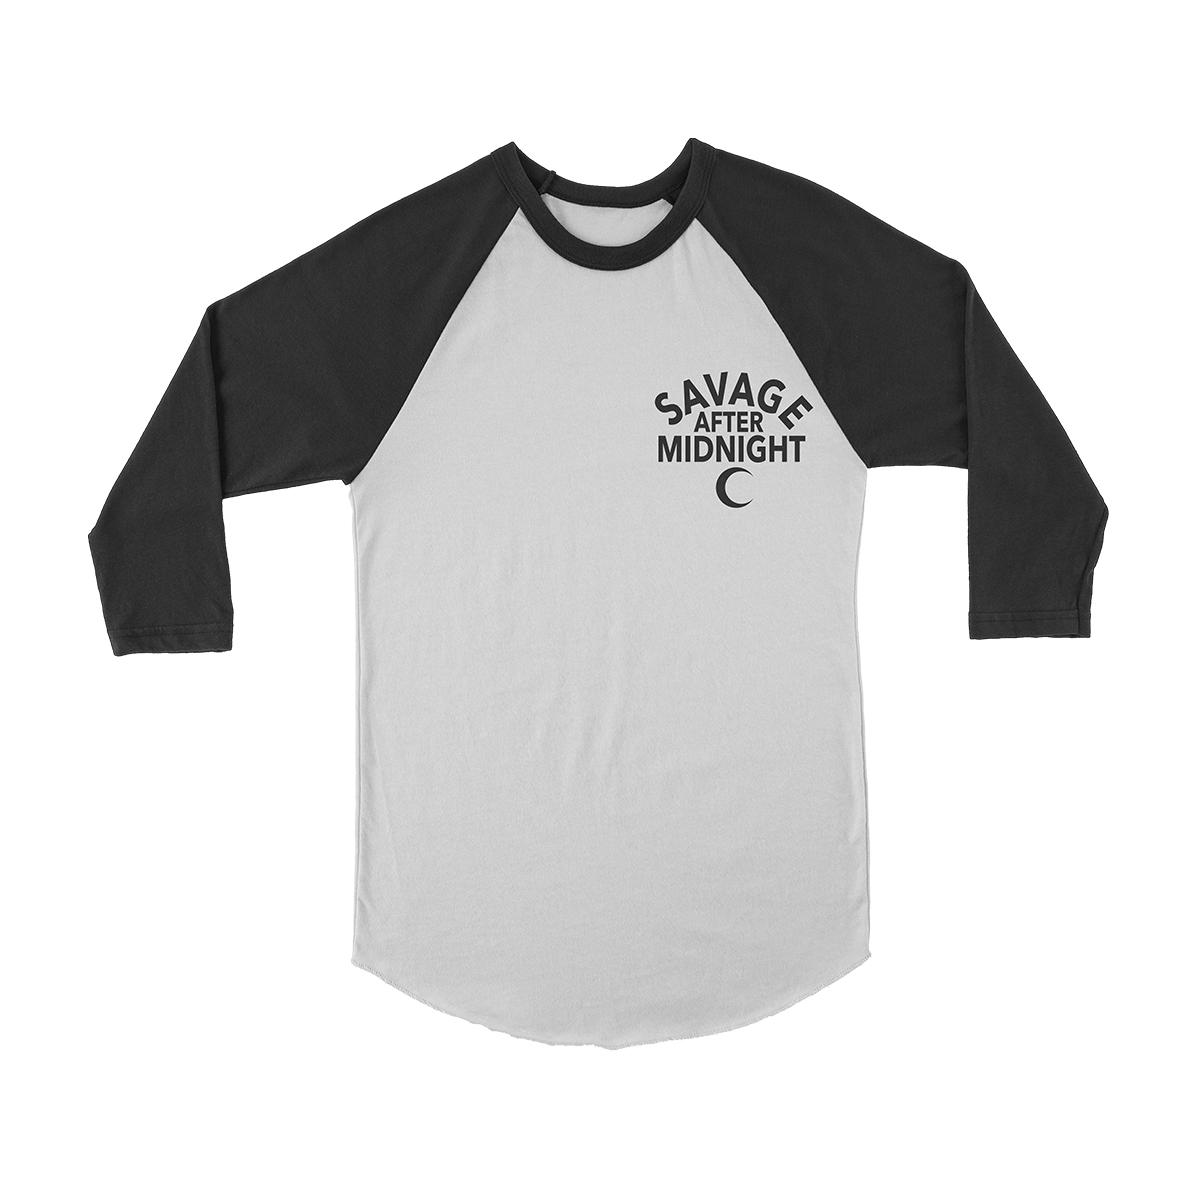 Savage After Midnight - Long Sleeve Raglan T-shirt